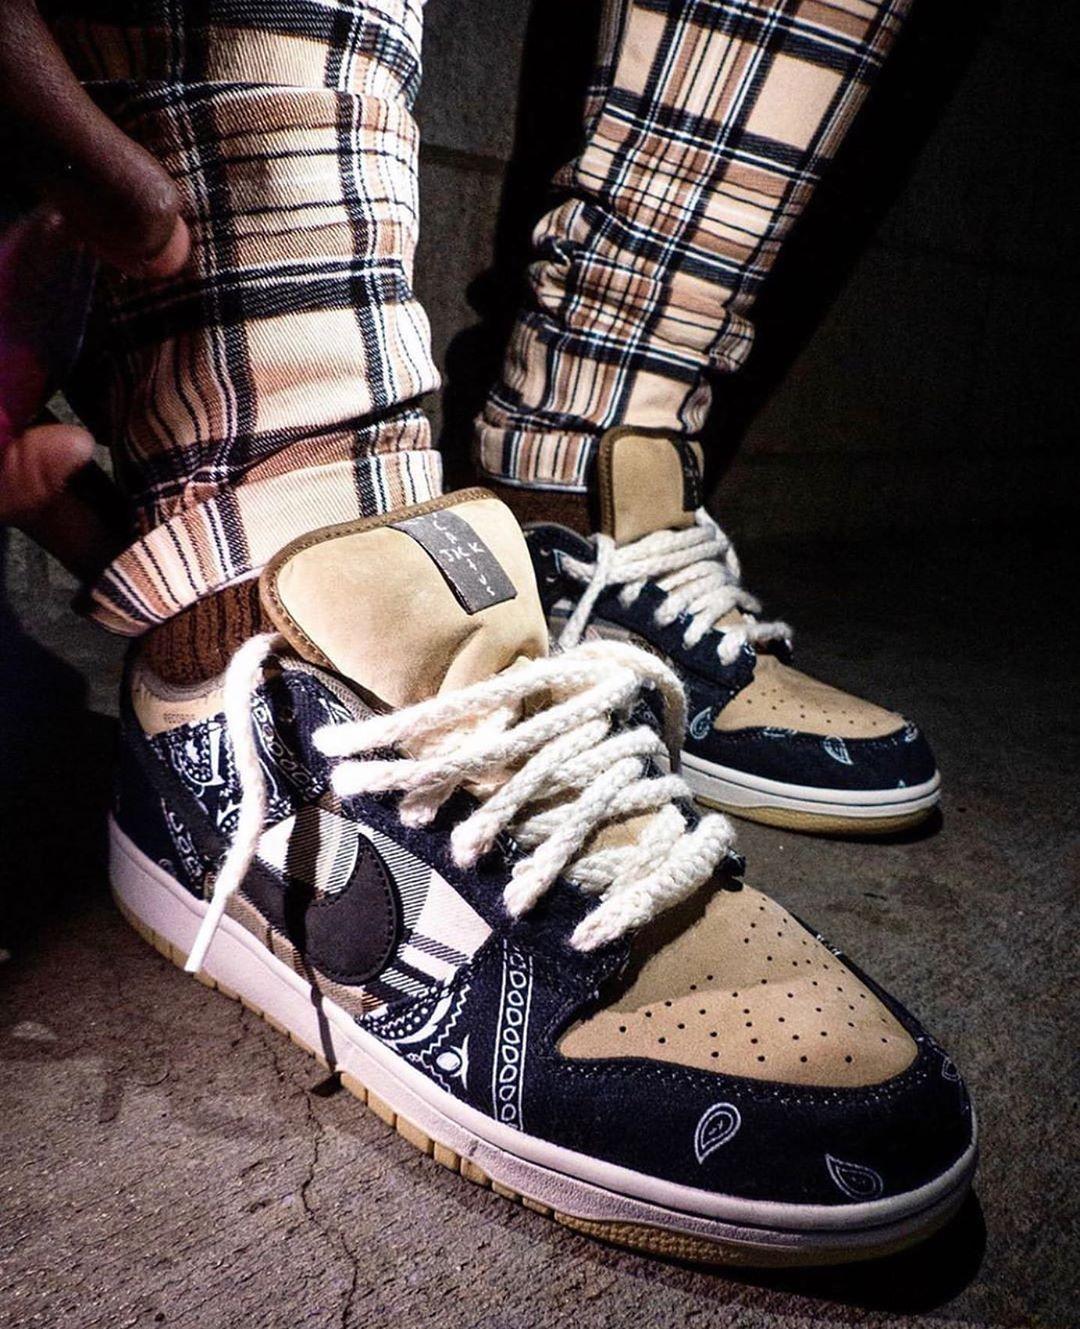 Highsnobiety Sneakers Hskicks On Instagram Here S An On Feet